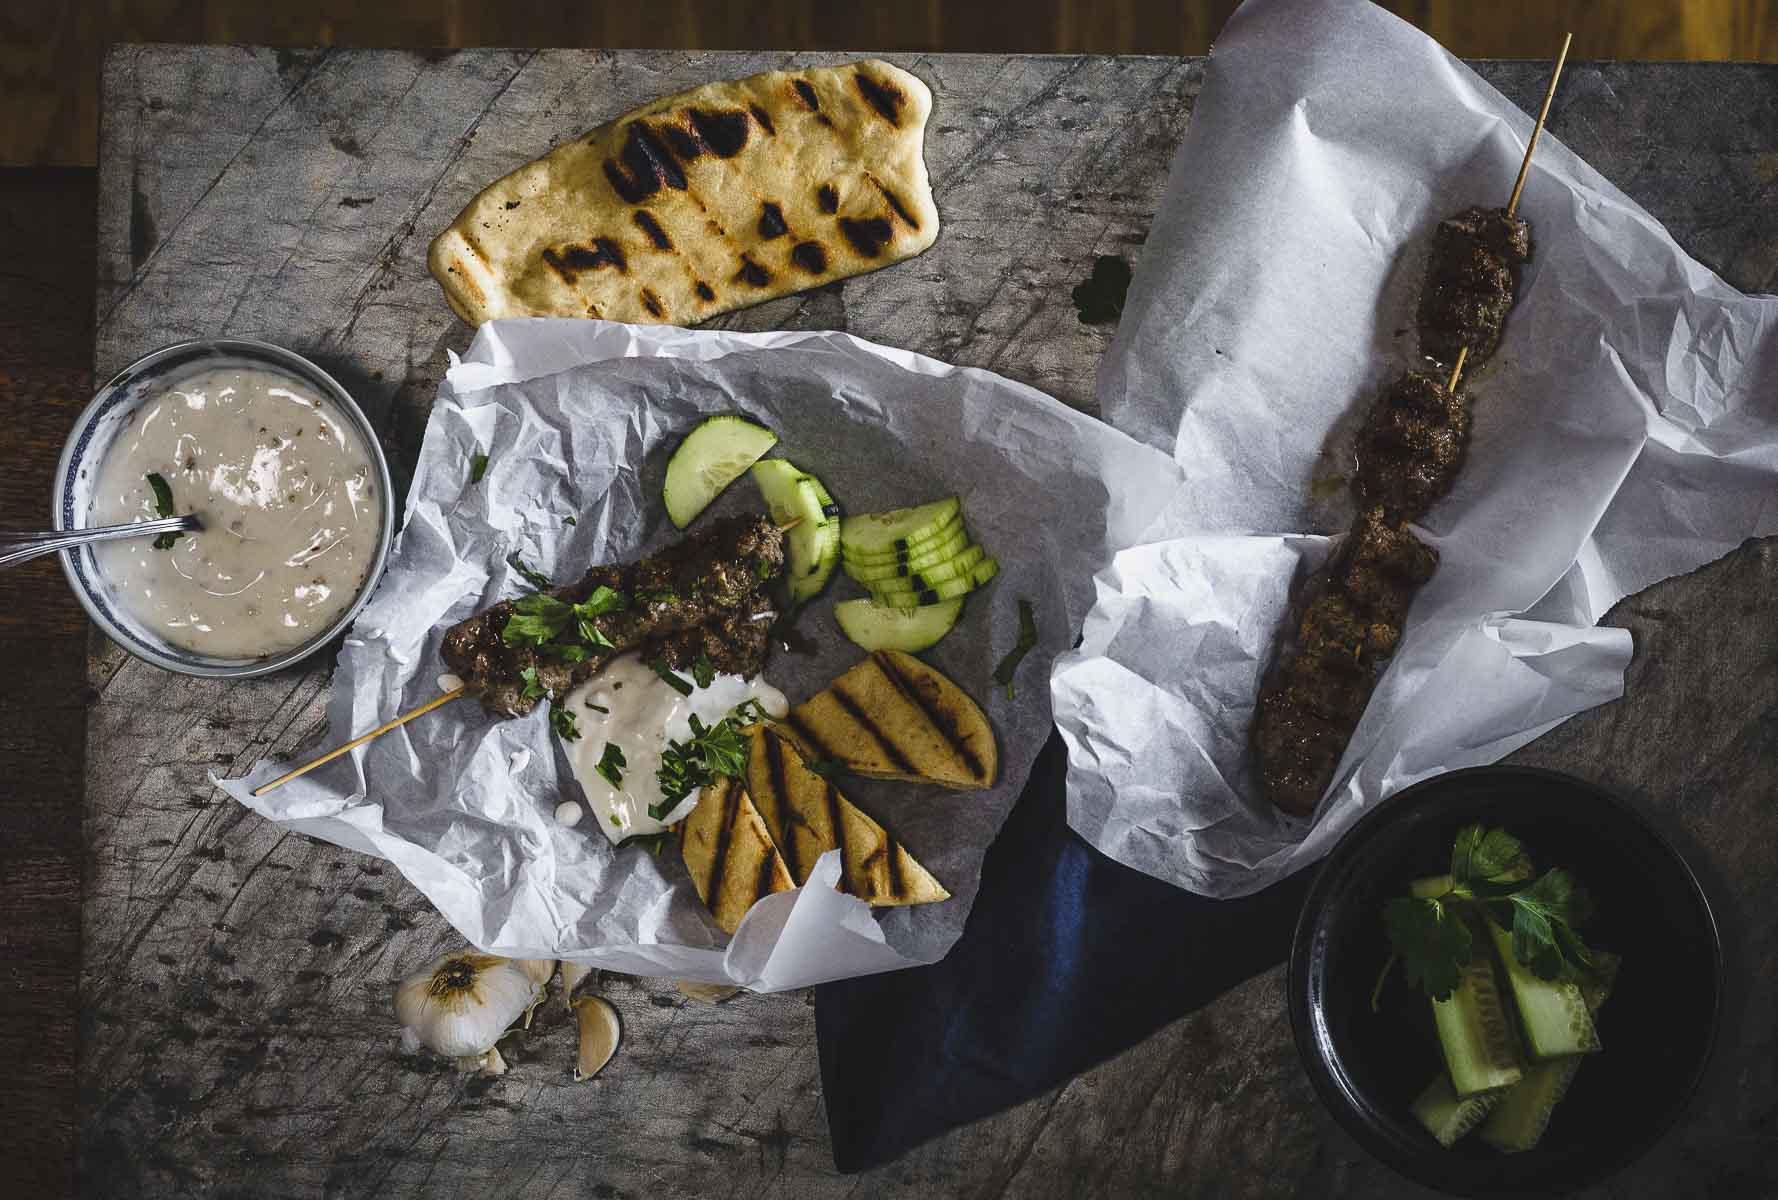 Kofta-esque: ground beef kebabs with yogurt dipping sauce